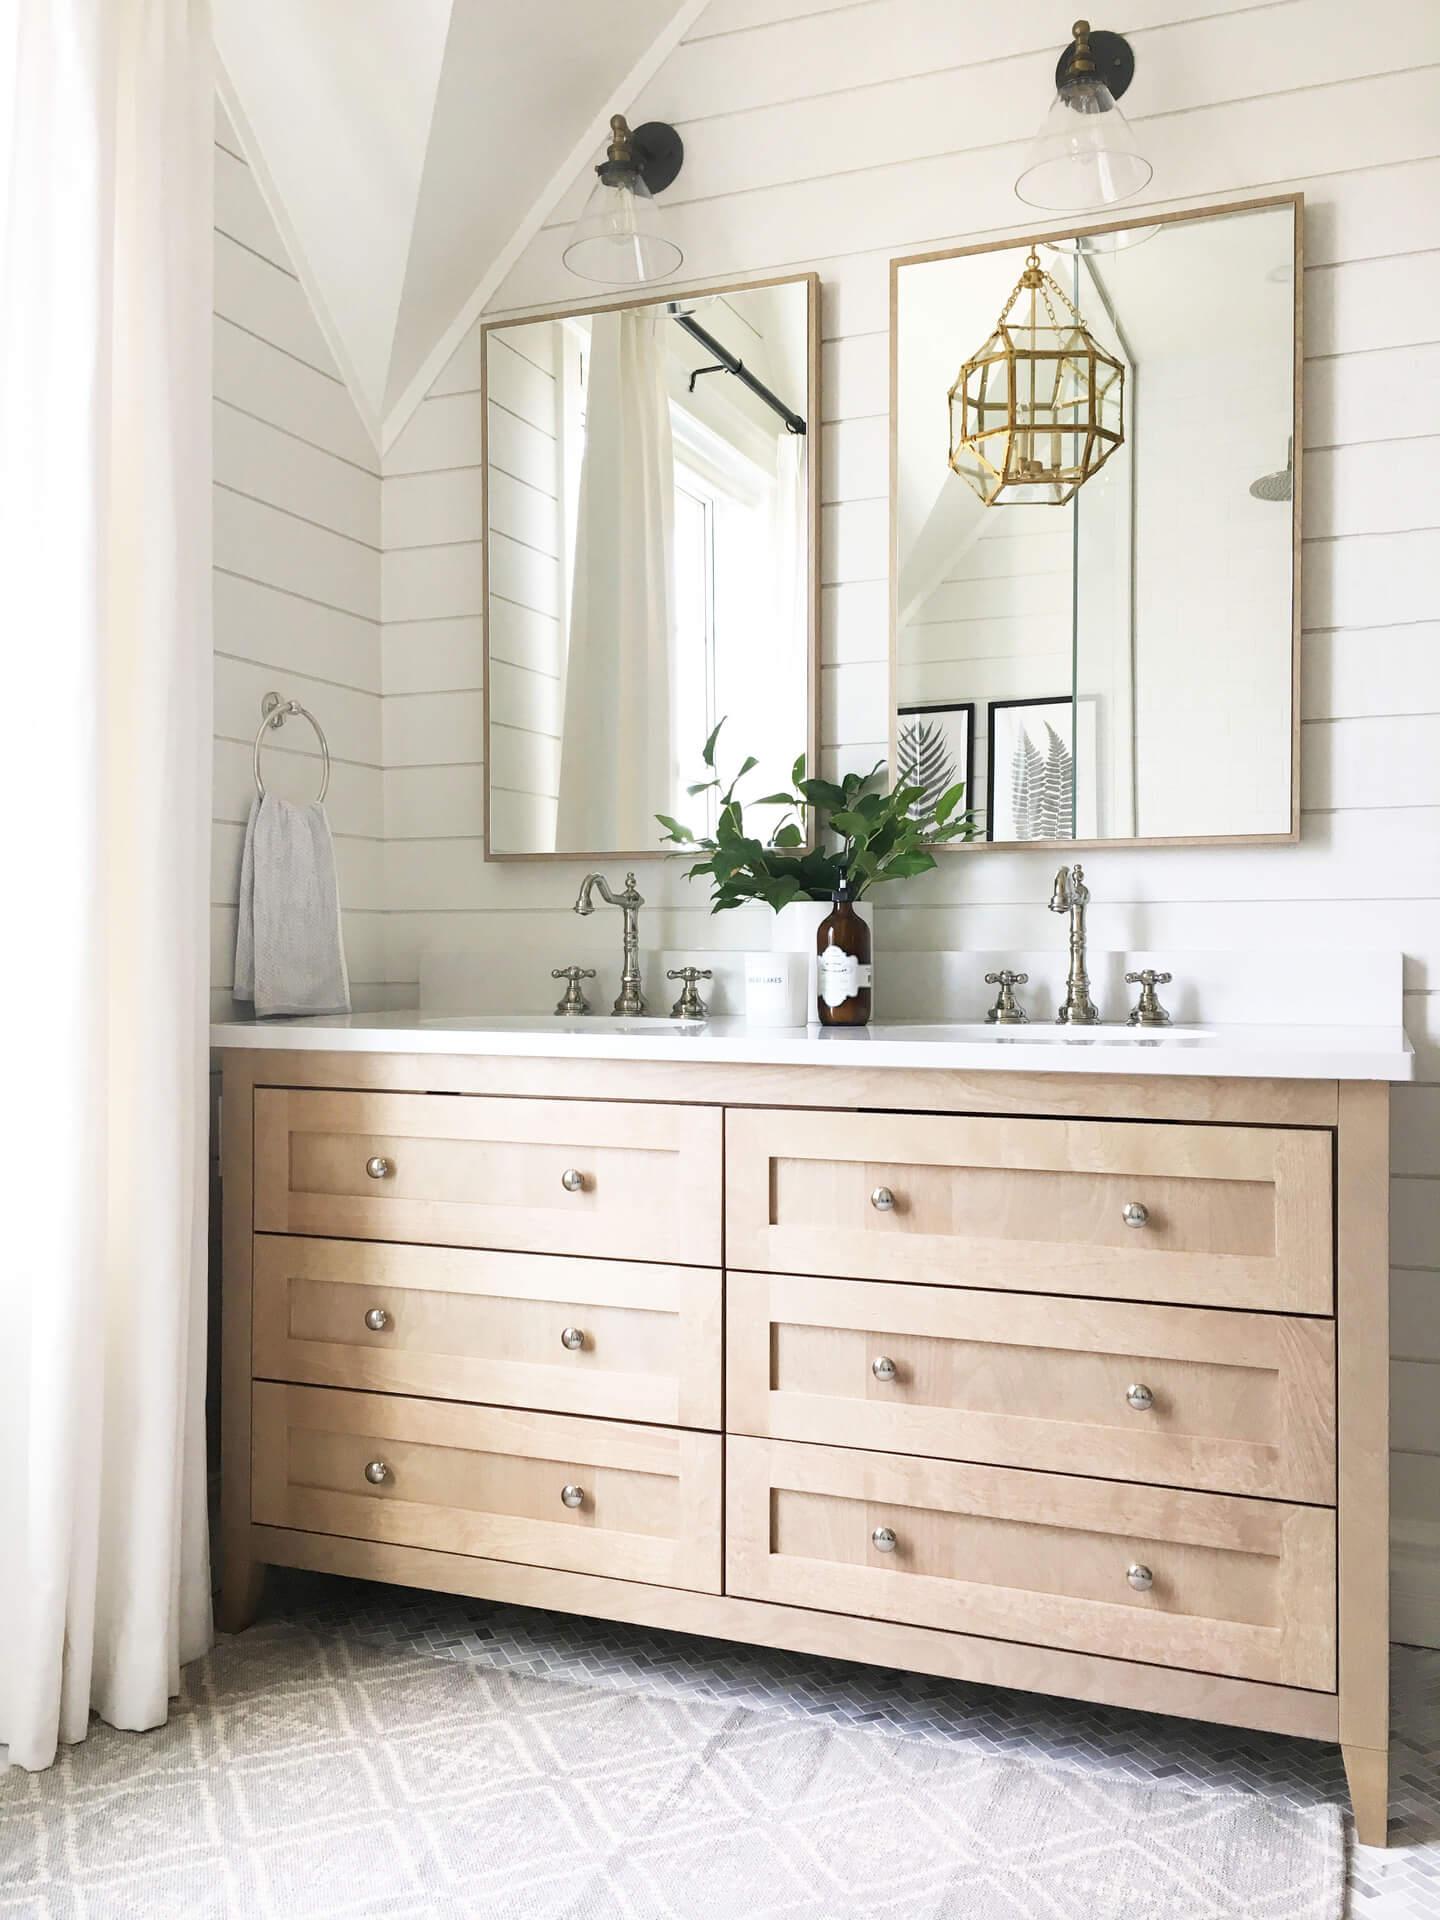 Leveillee AKB Design salle de bain vanite bois marbre herringbone shiplap farmhouse style 1